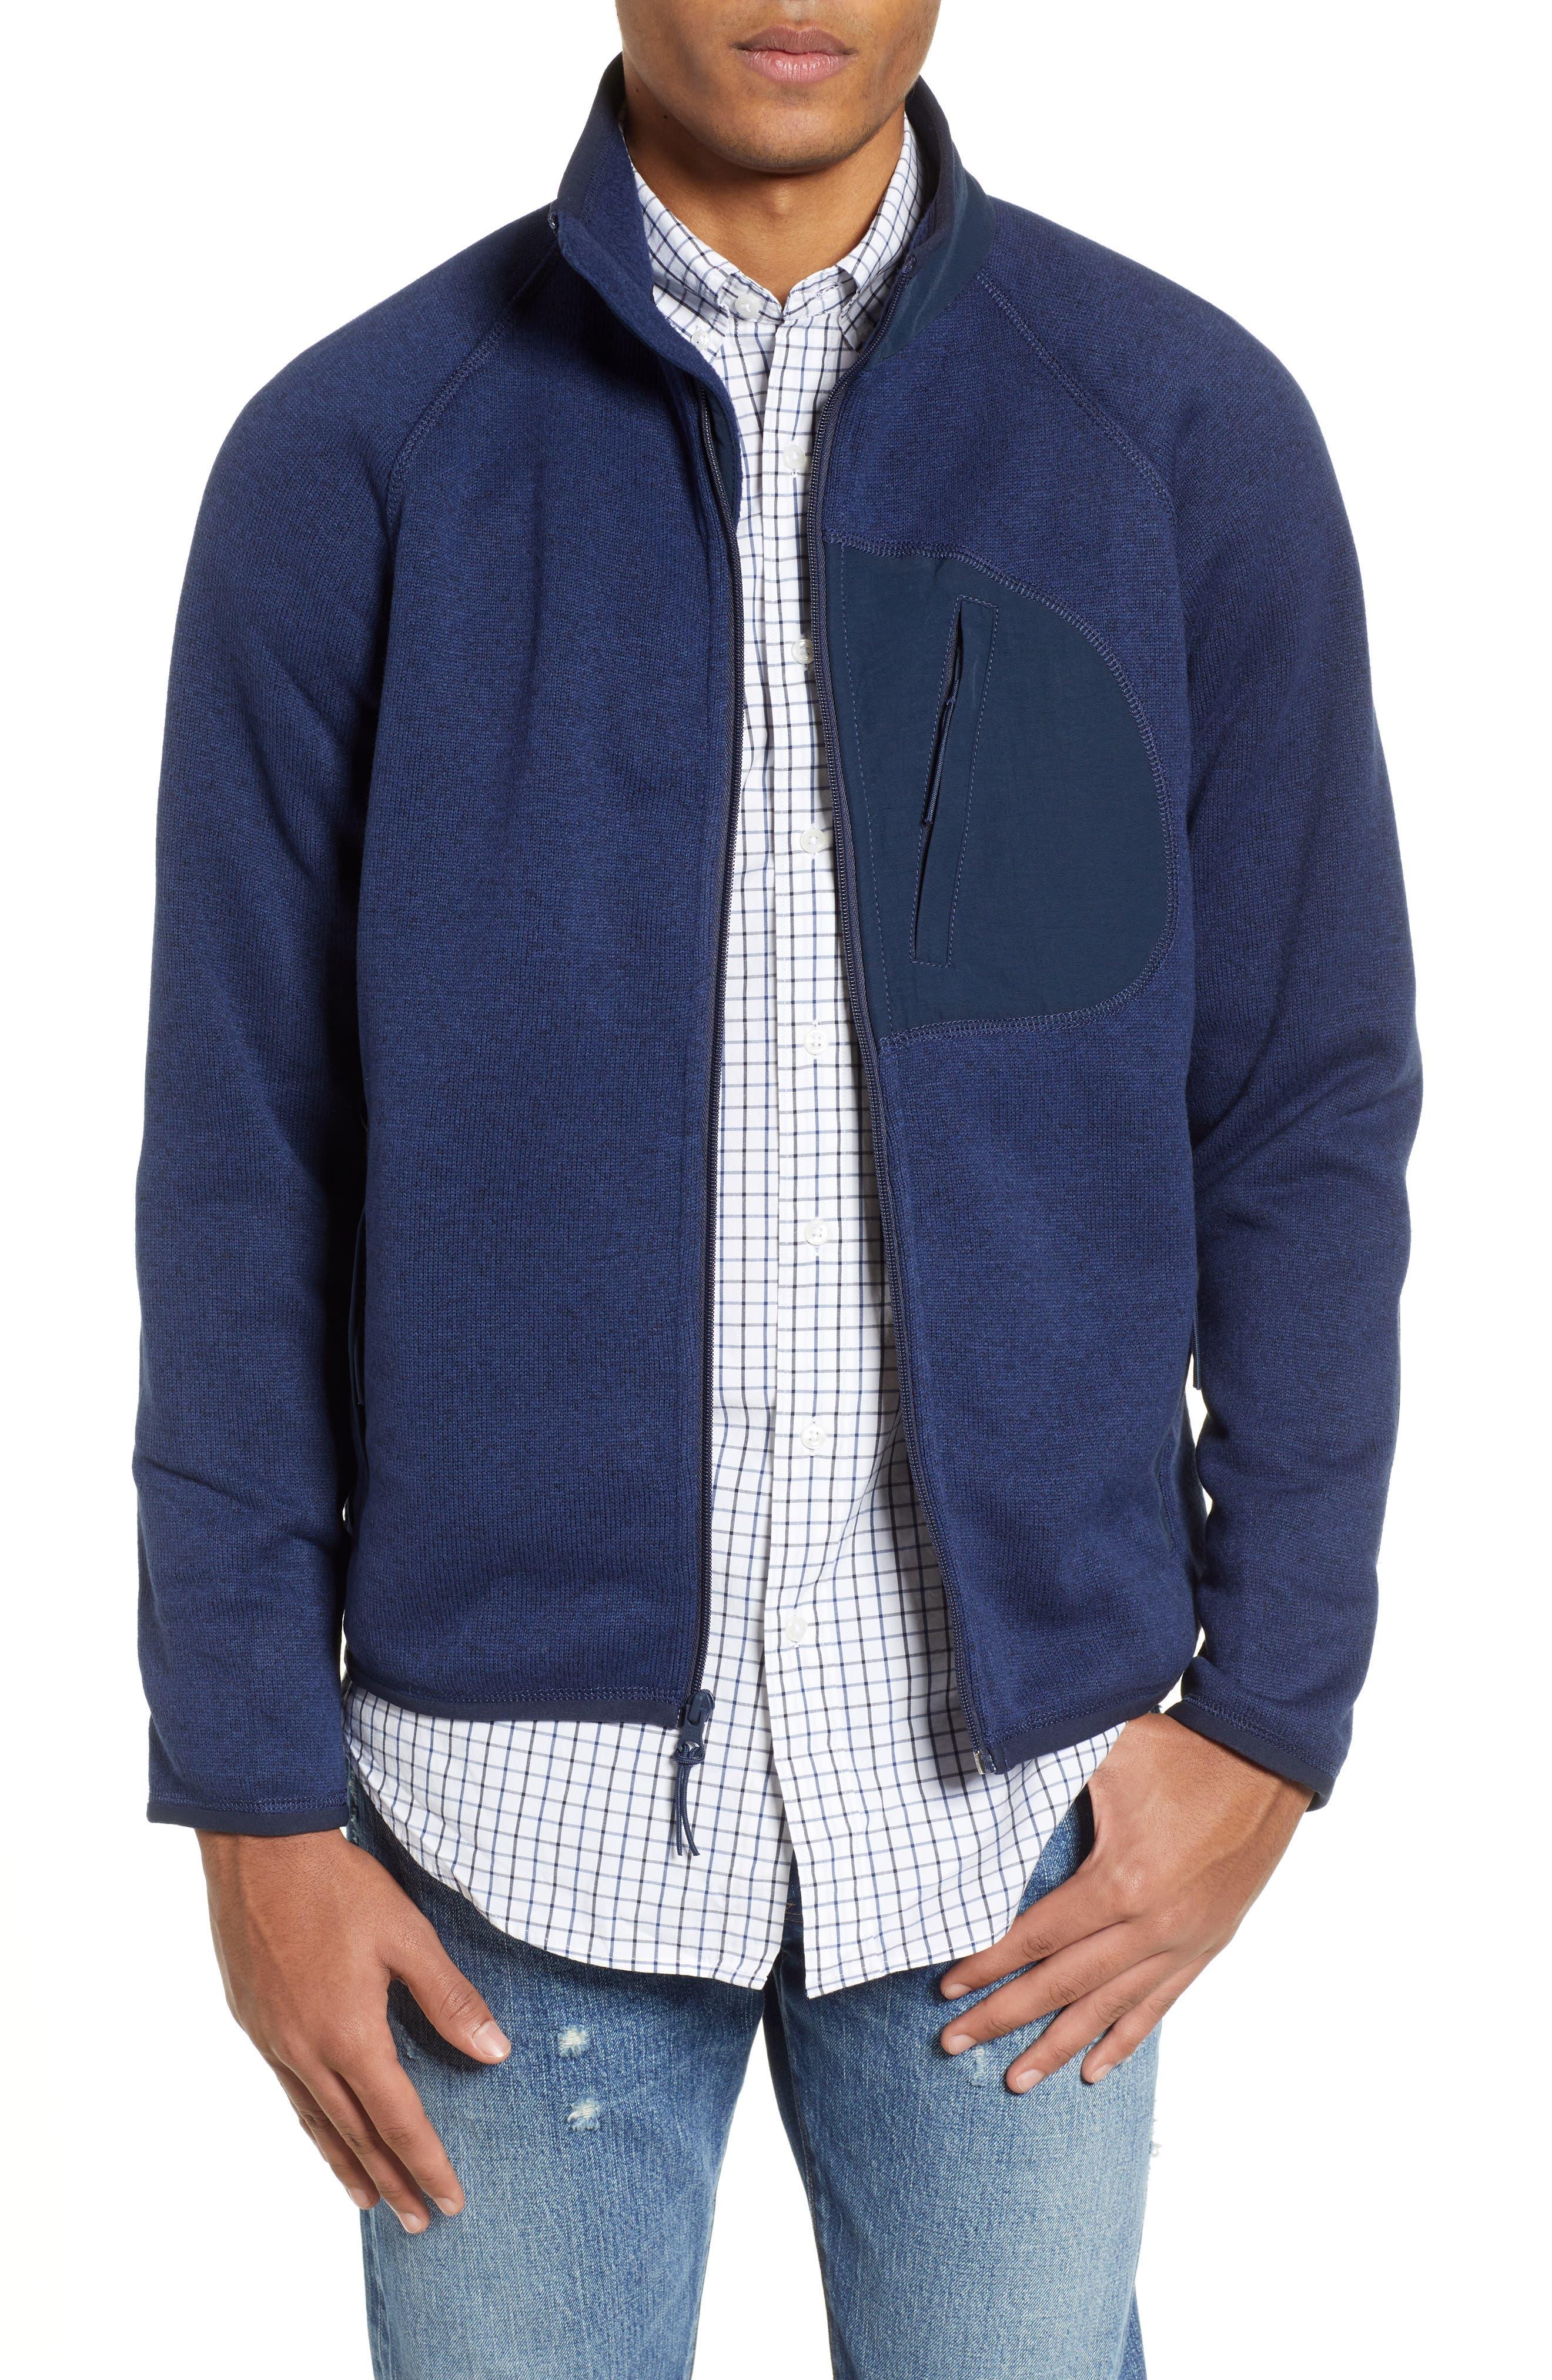 J.crew Classic Fit Fleece Sweater Jacket